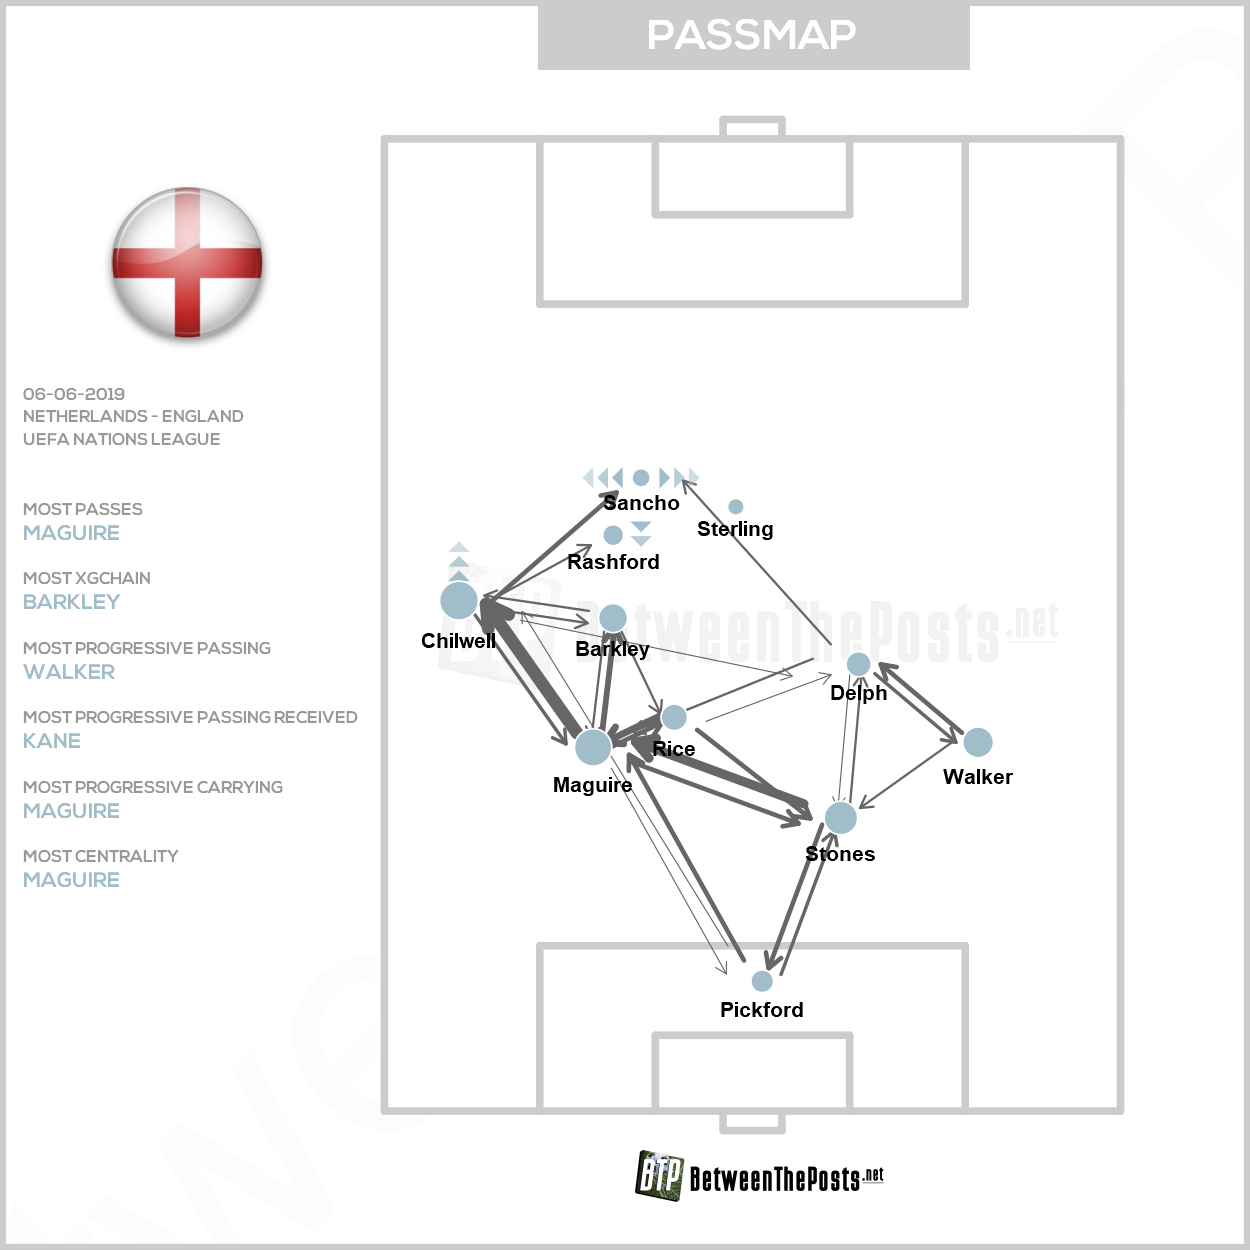 Passmap Netherlands England 3-1 Nations League